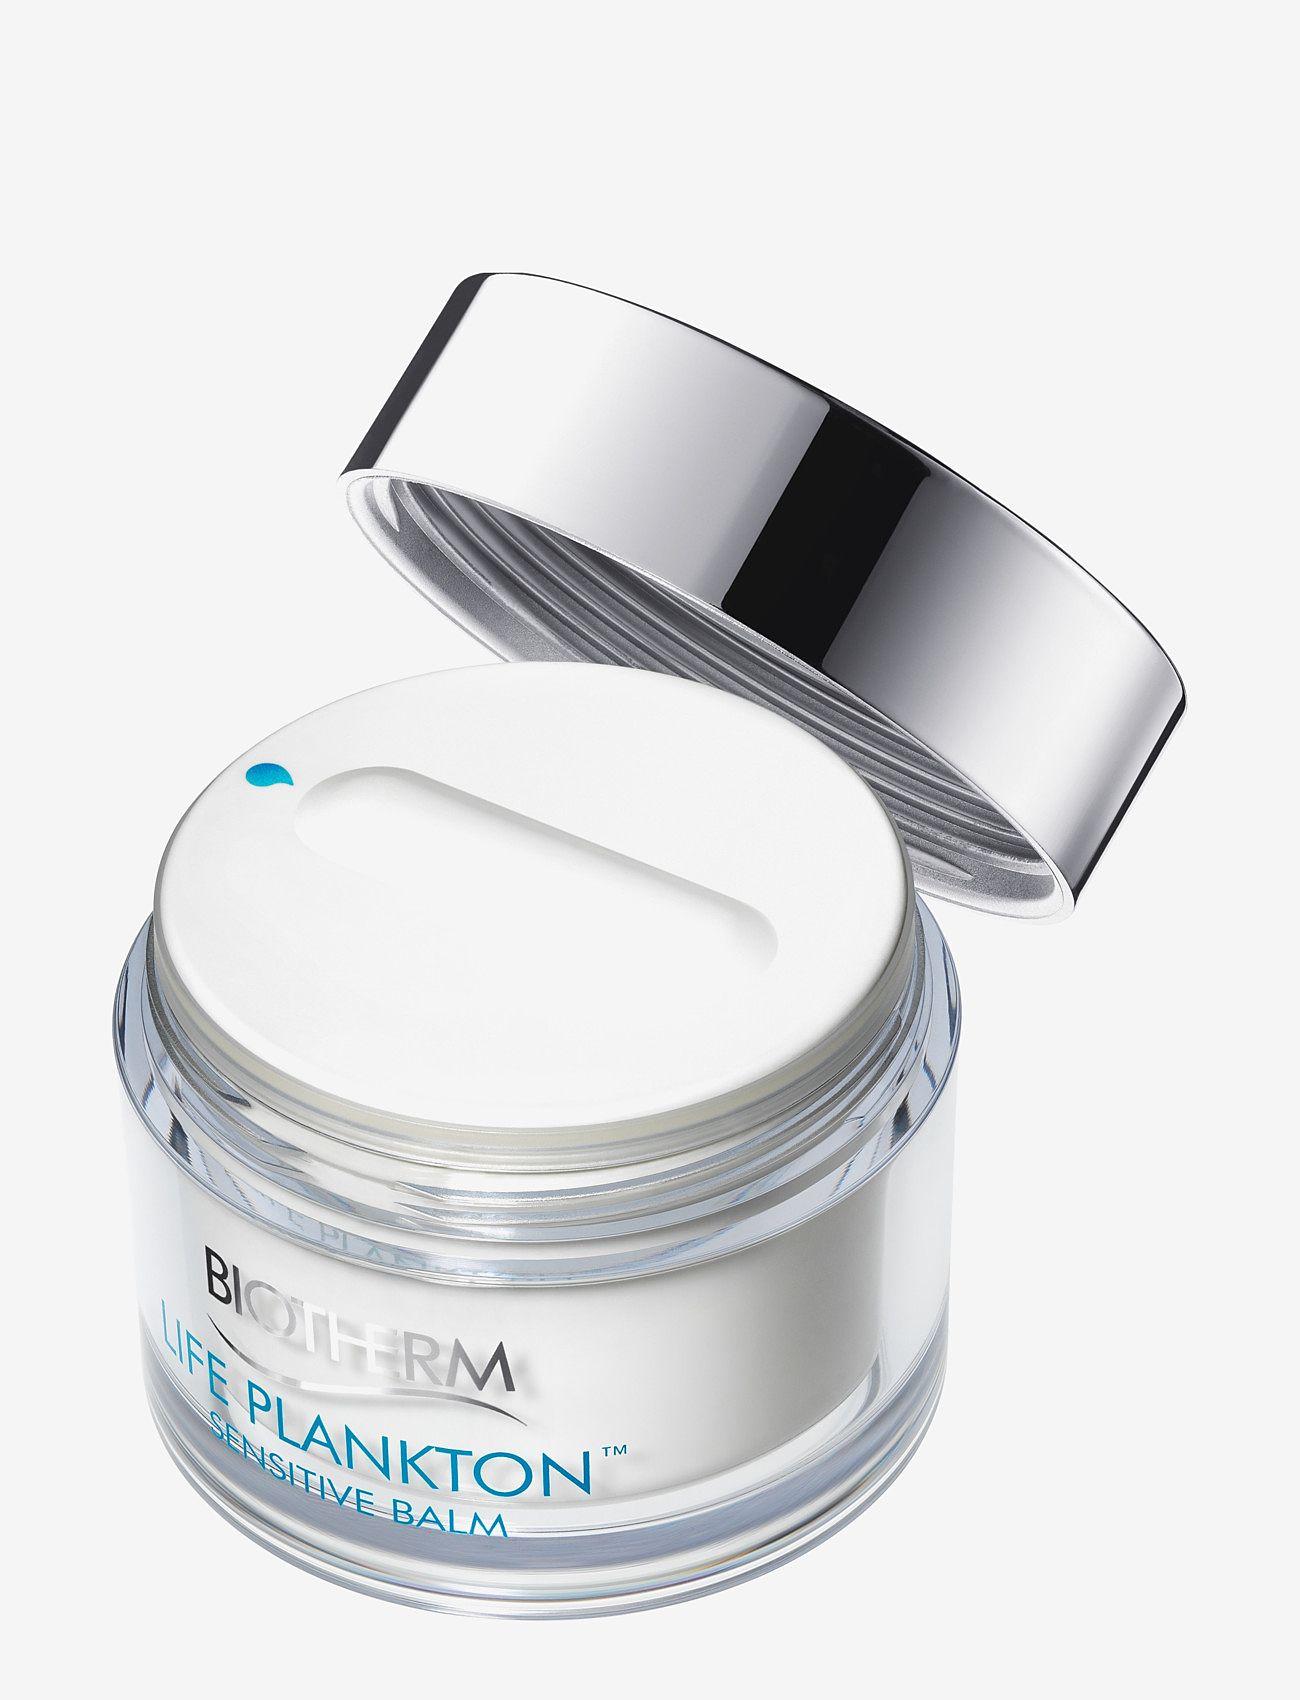 Biotherm - Life Plankton Sensitive Balm 50ml - dagkräm - clear - 1